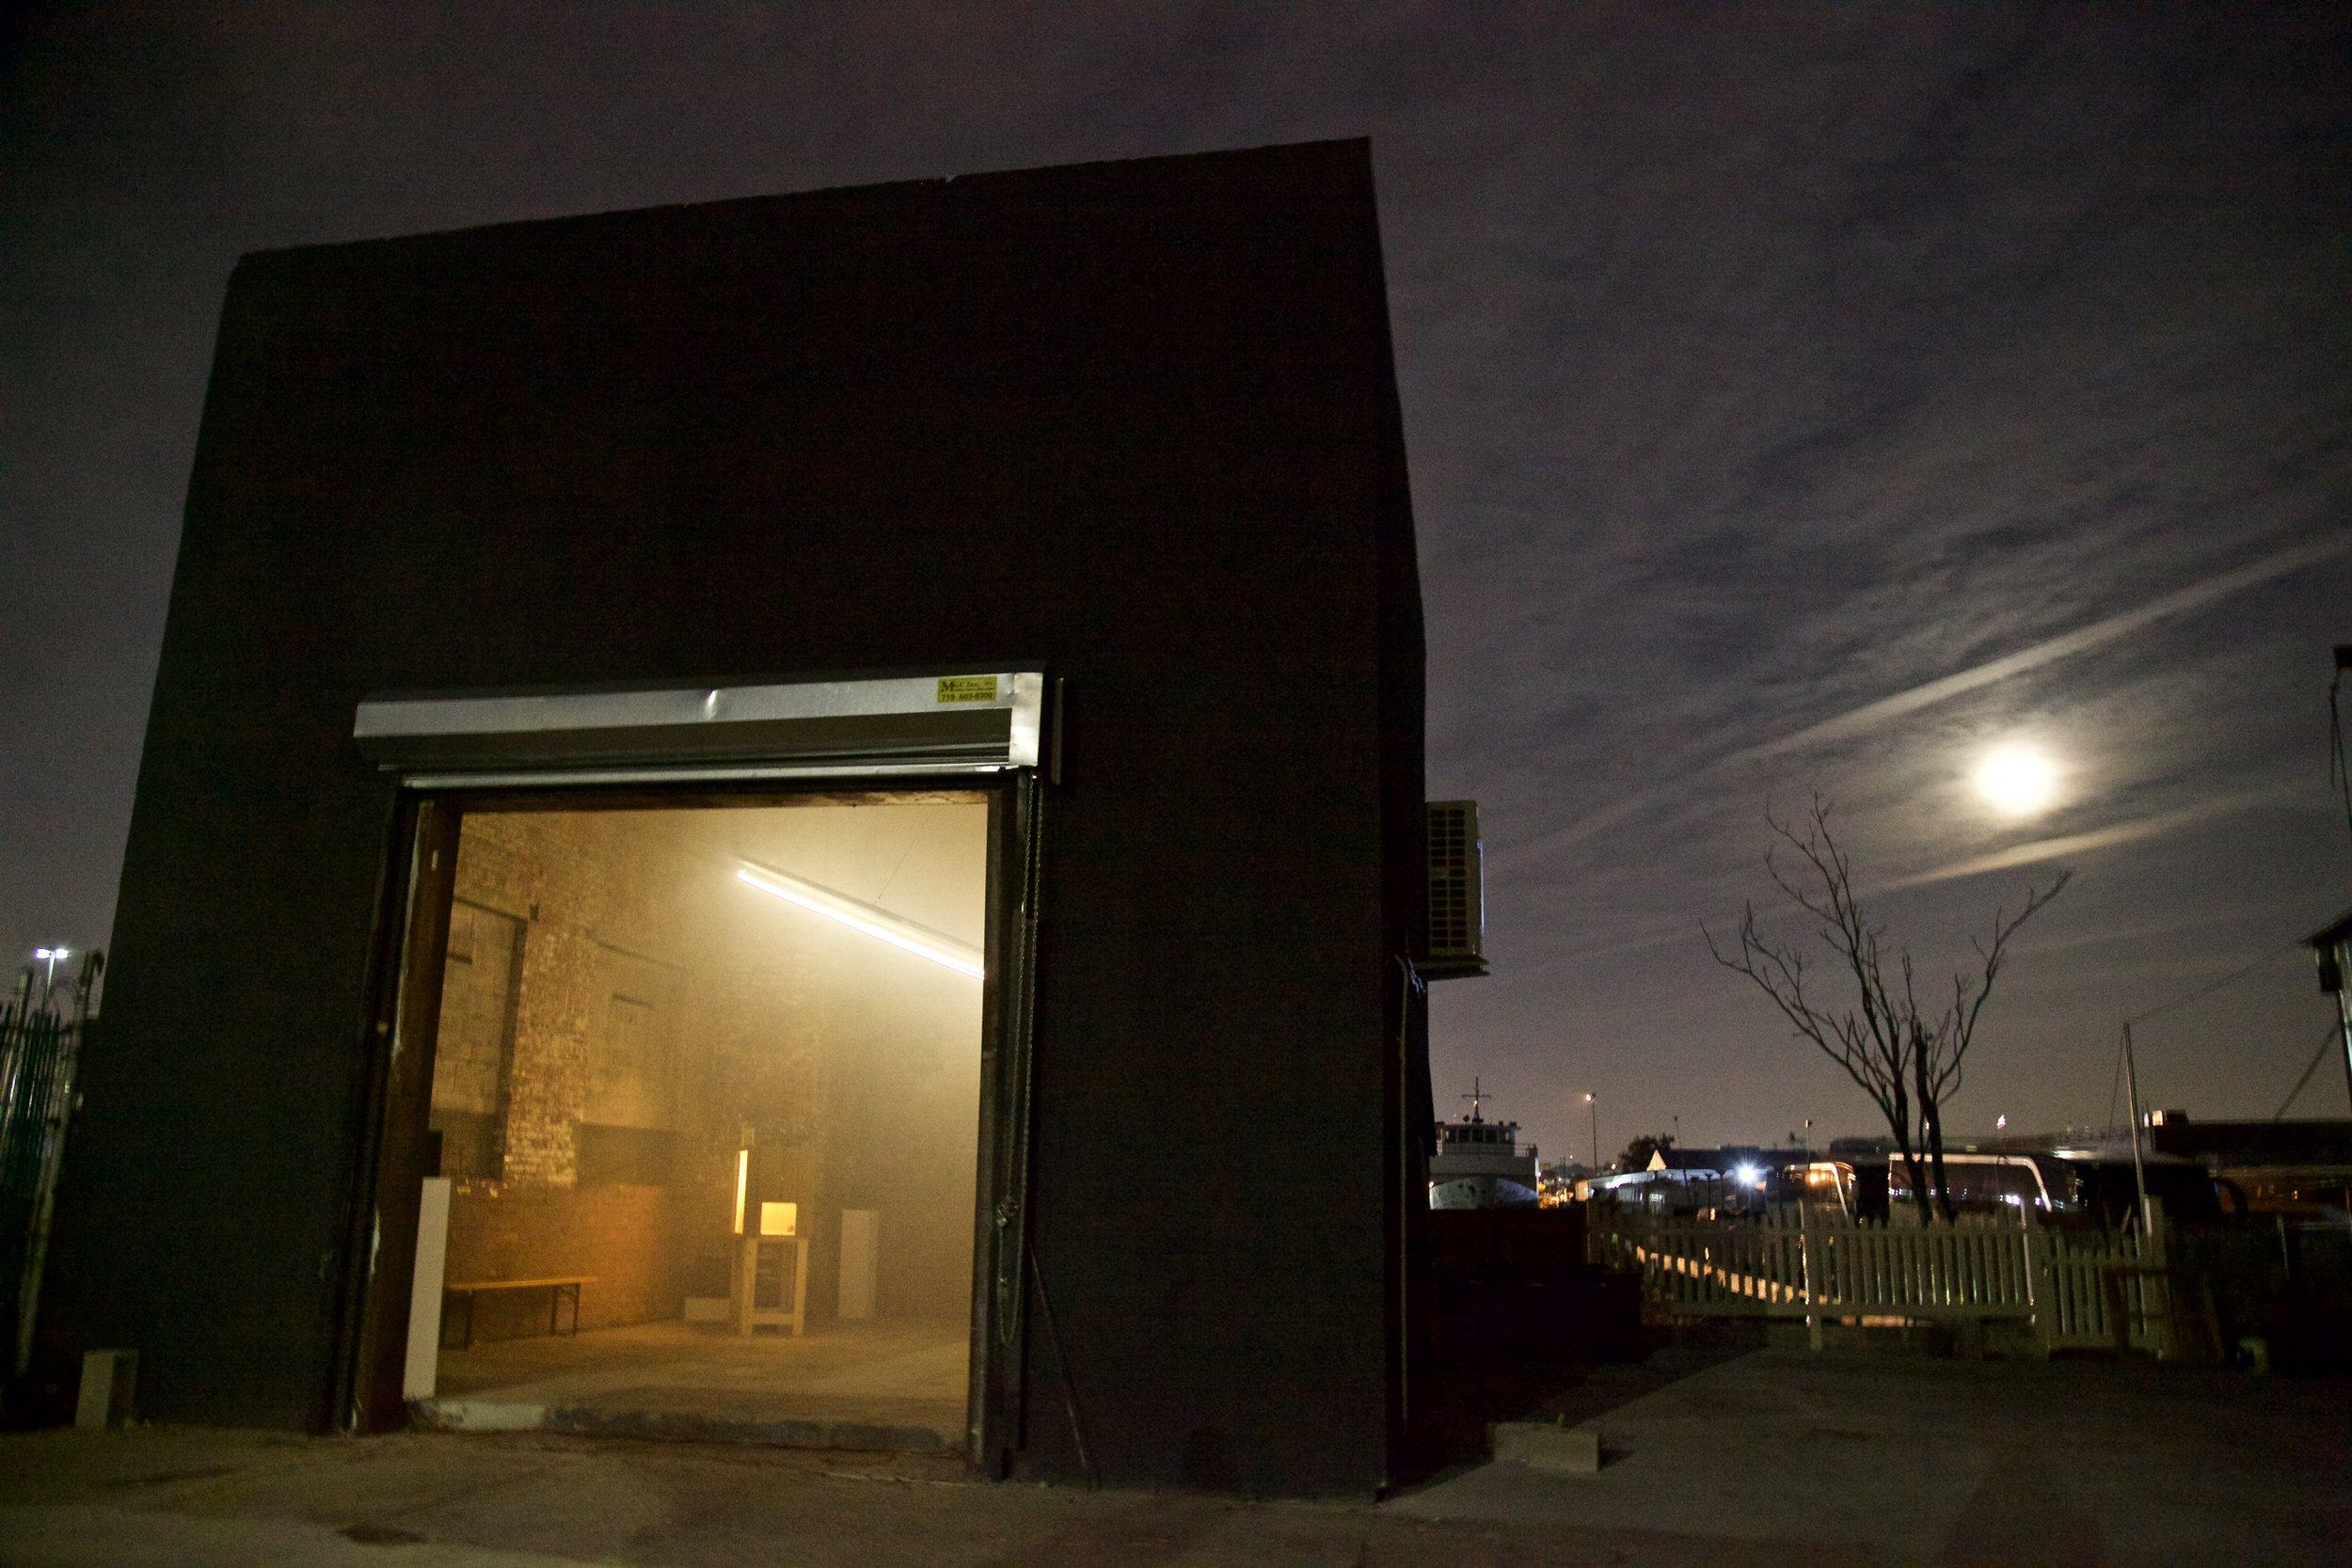 Installation view of Raphaele Shirley - Photo: The Chimney